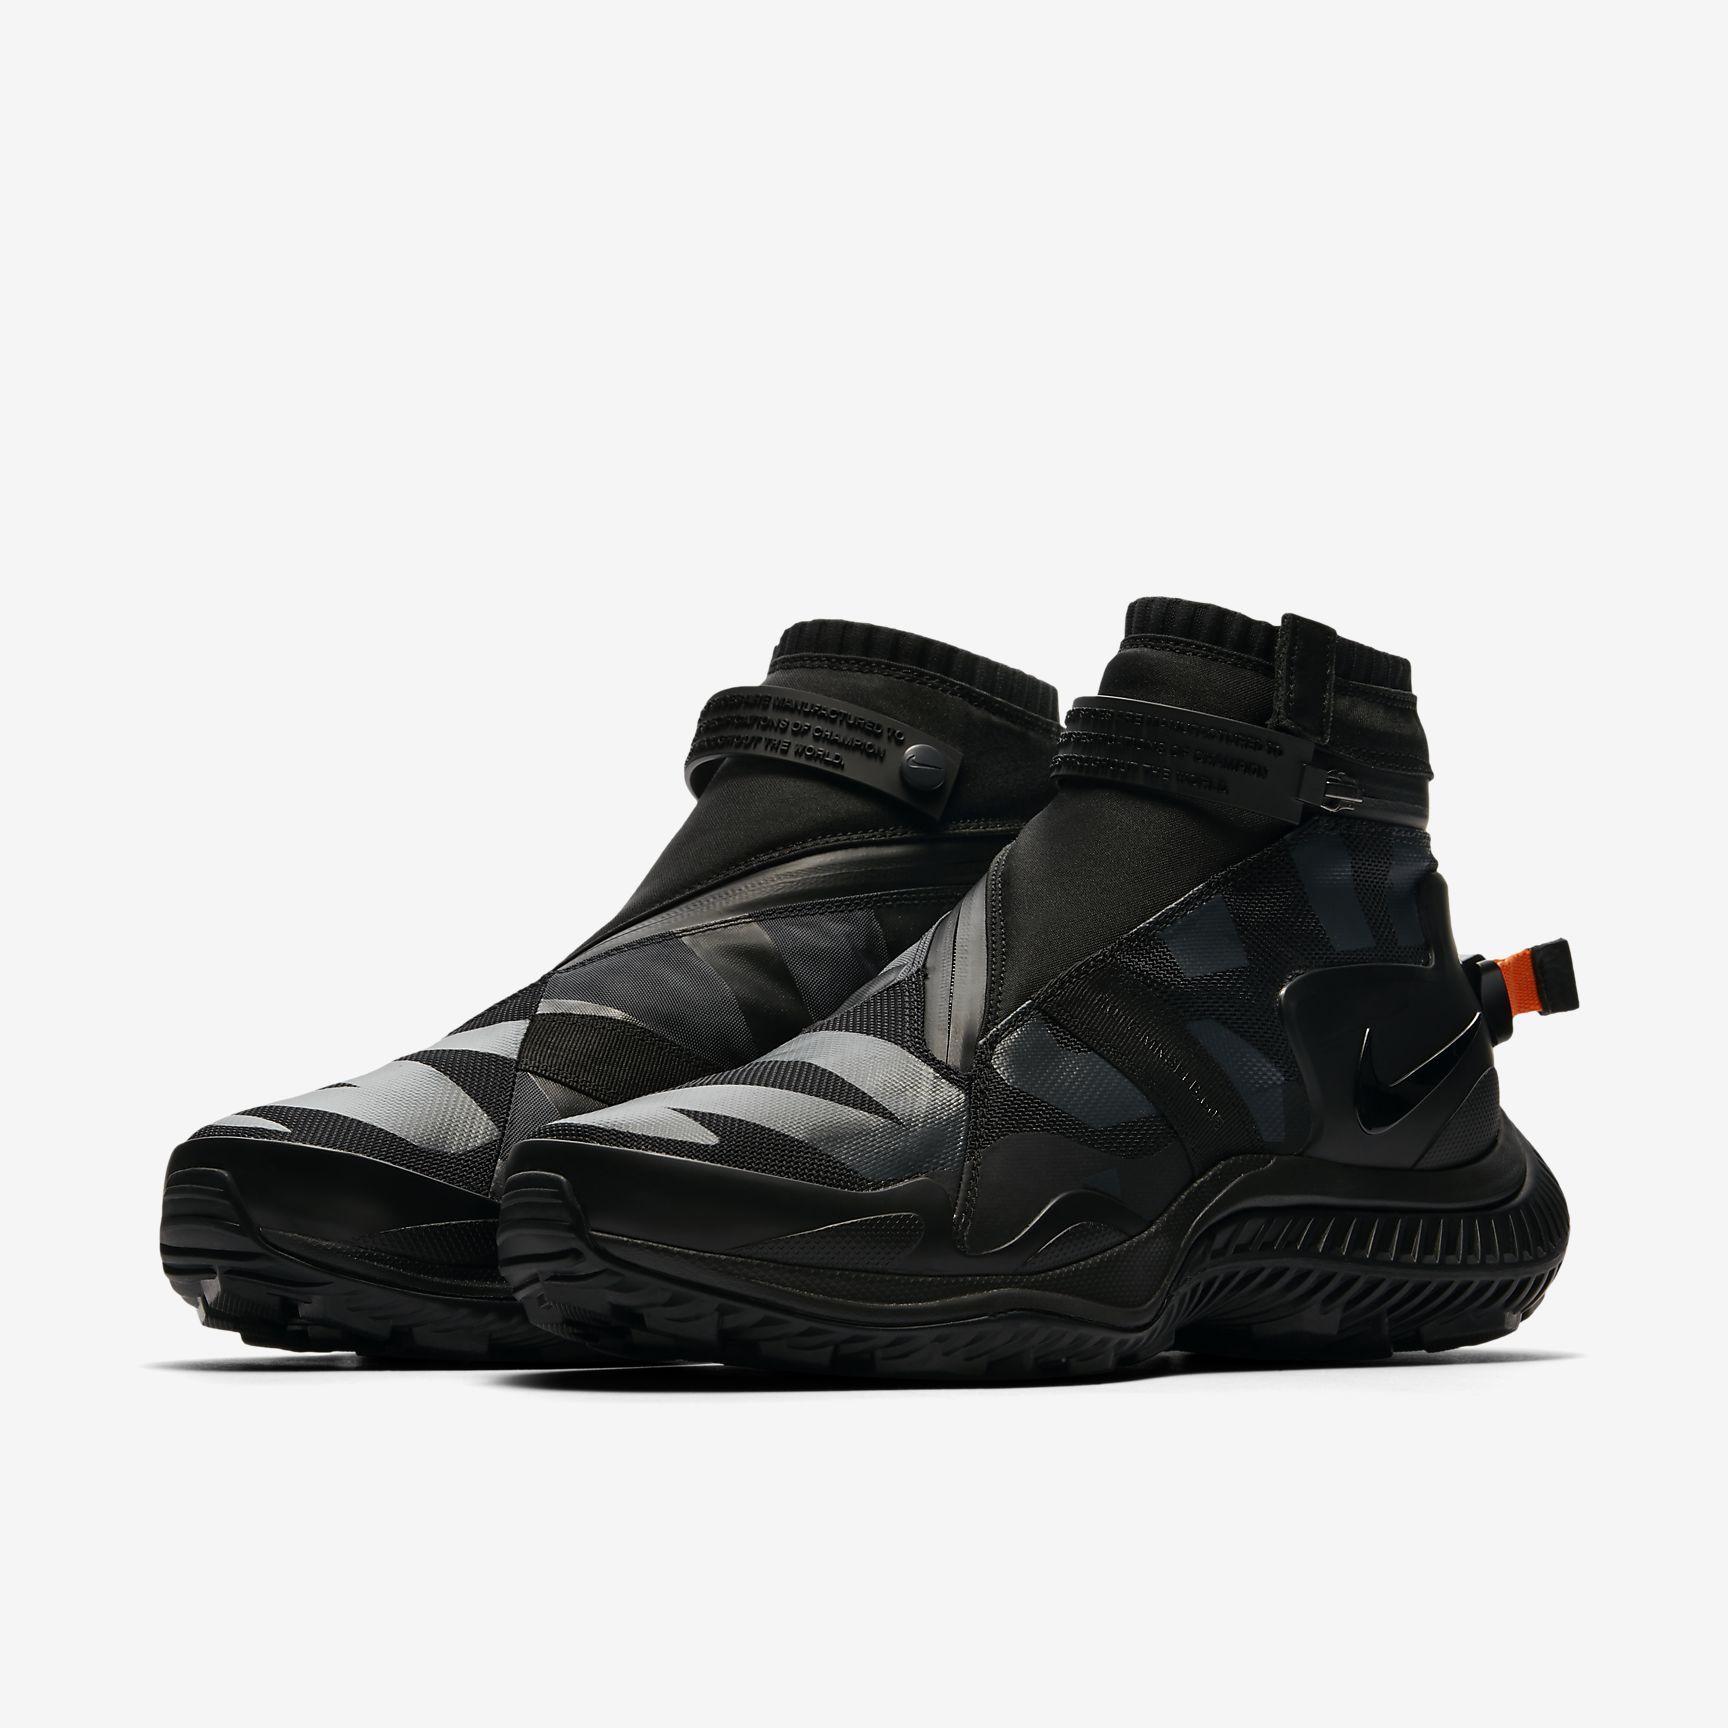 Nike Gaiter Mens Boot #Techwear